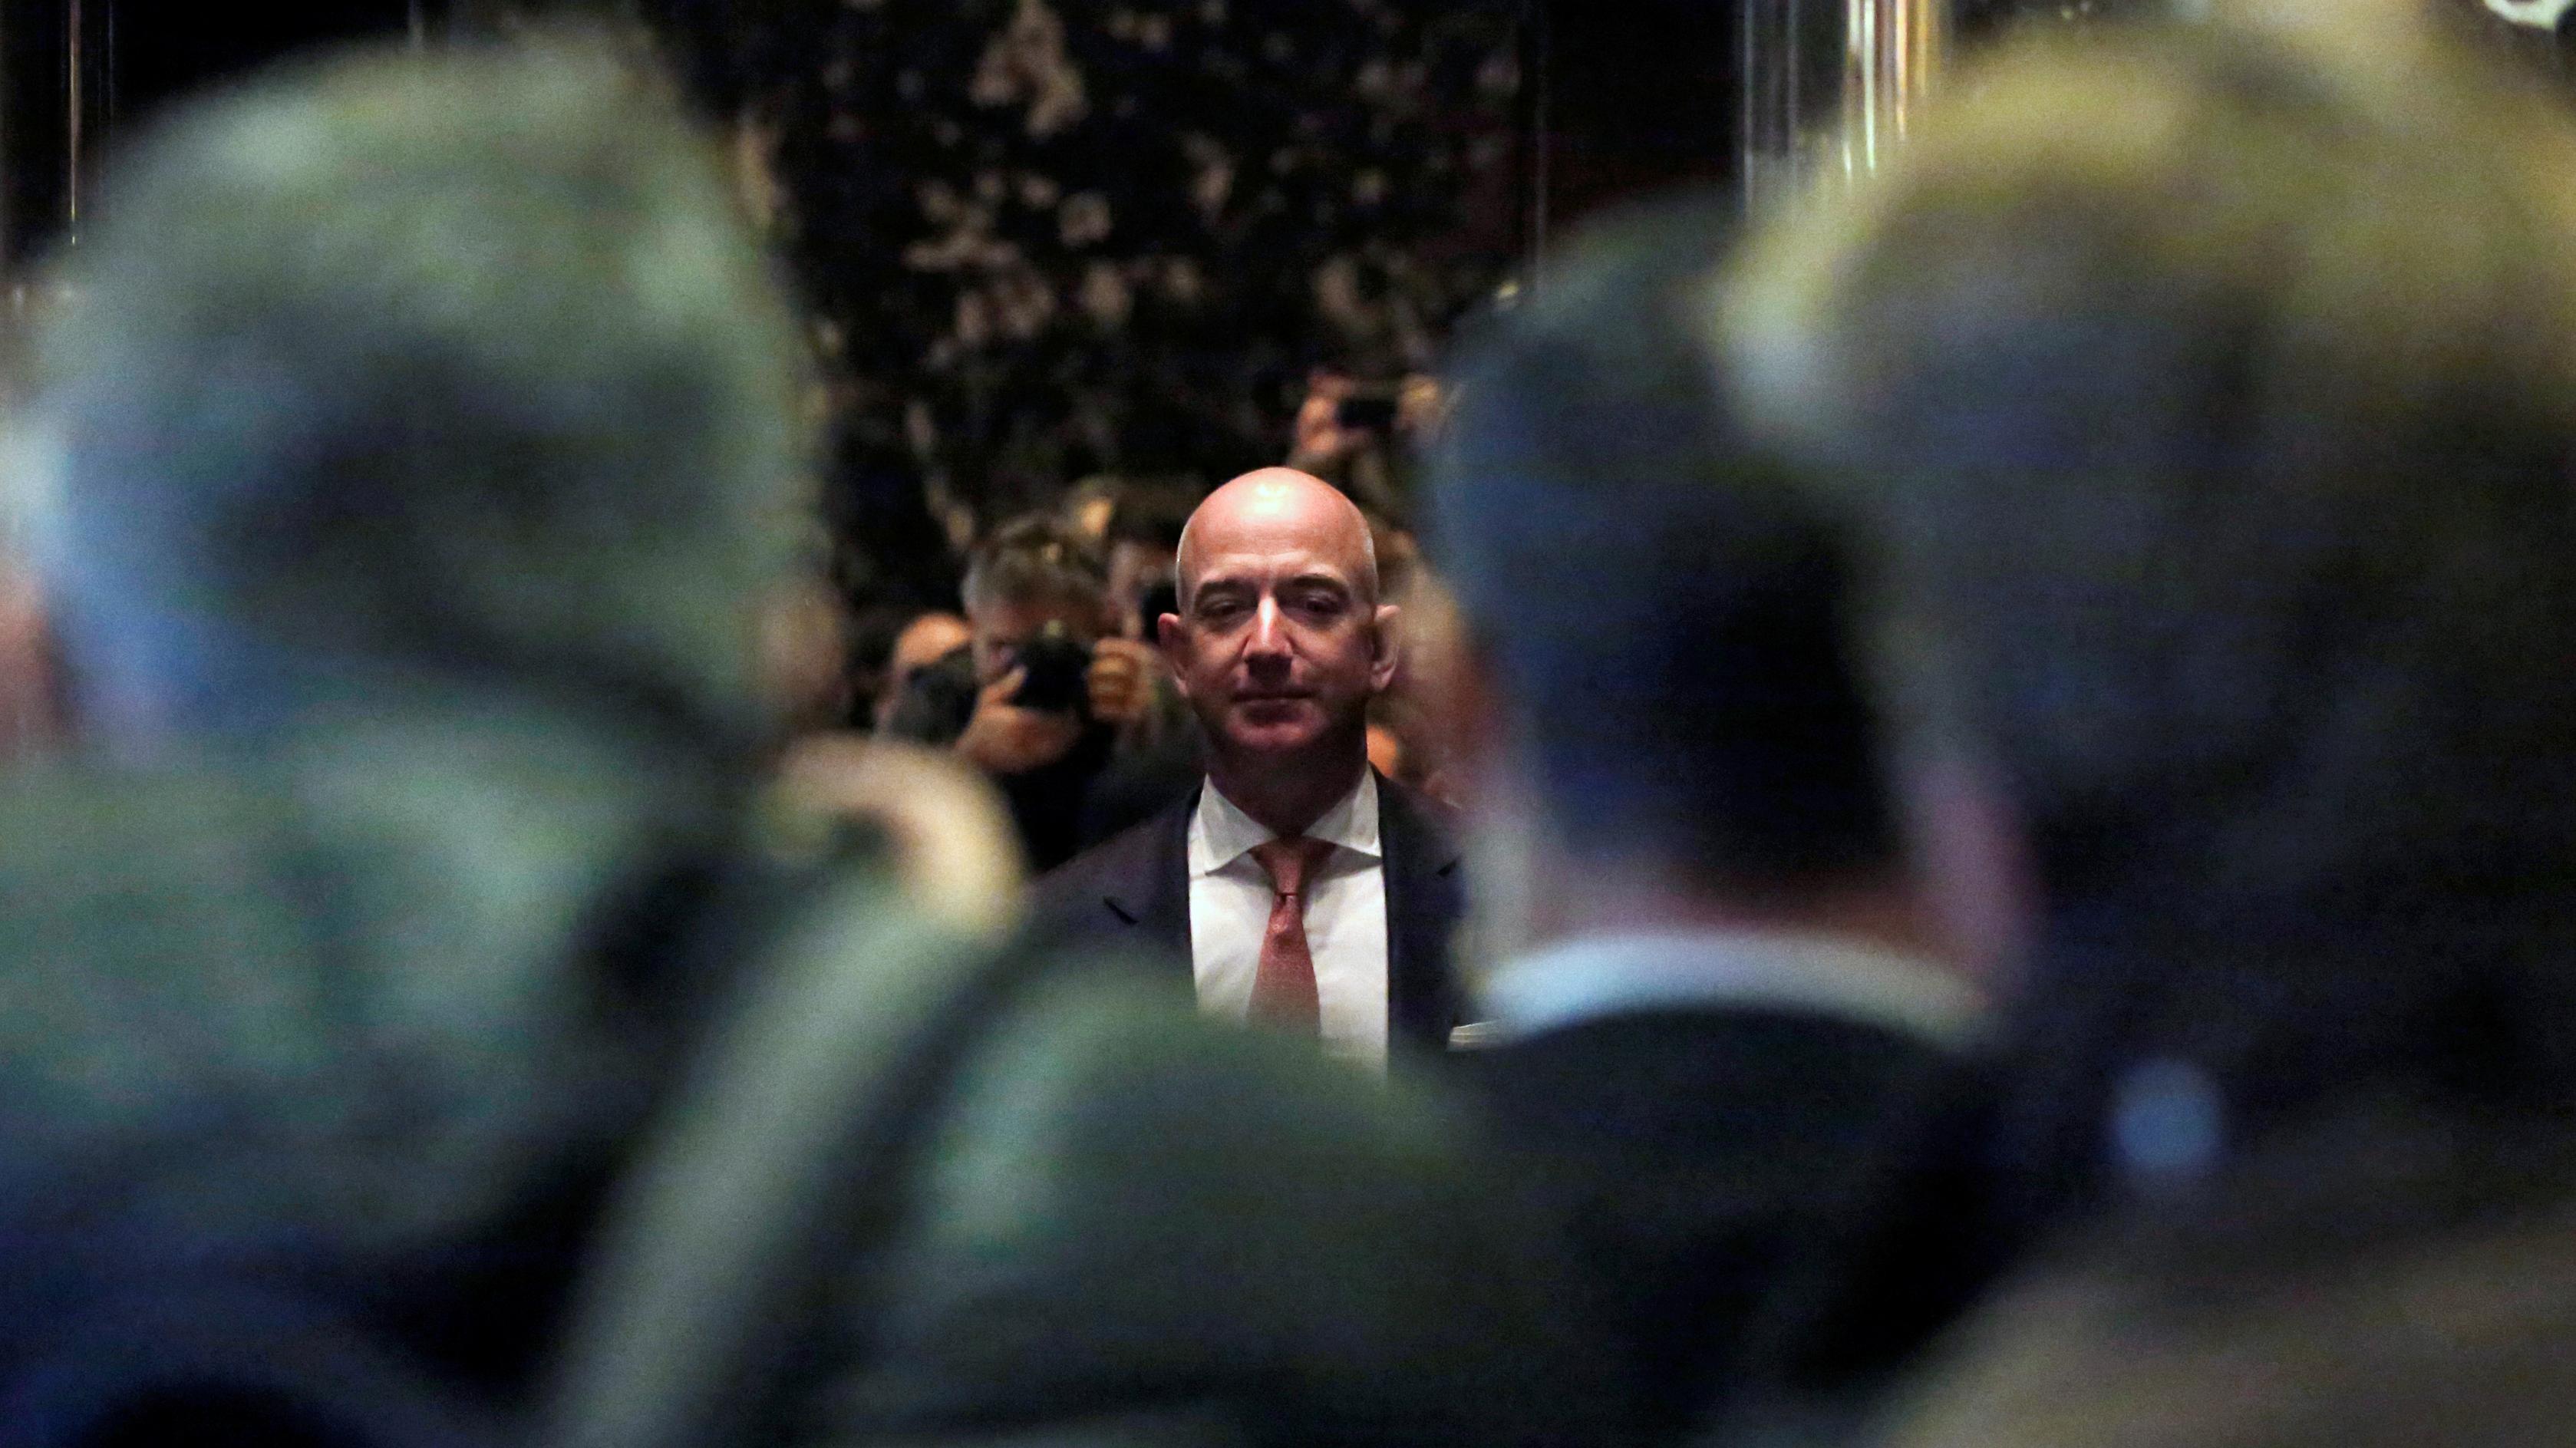 A fresh, organic problem for Amazon.